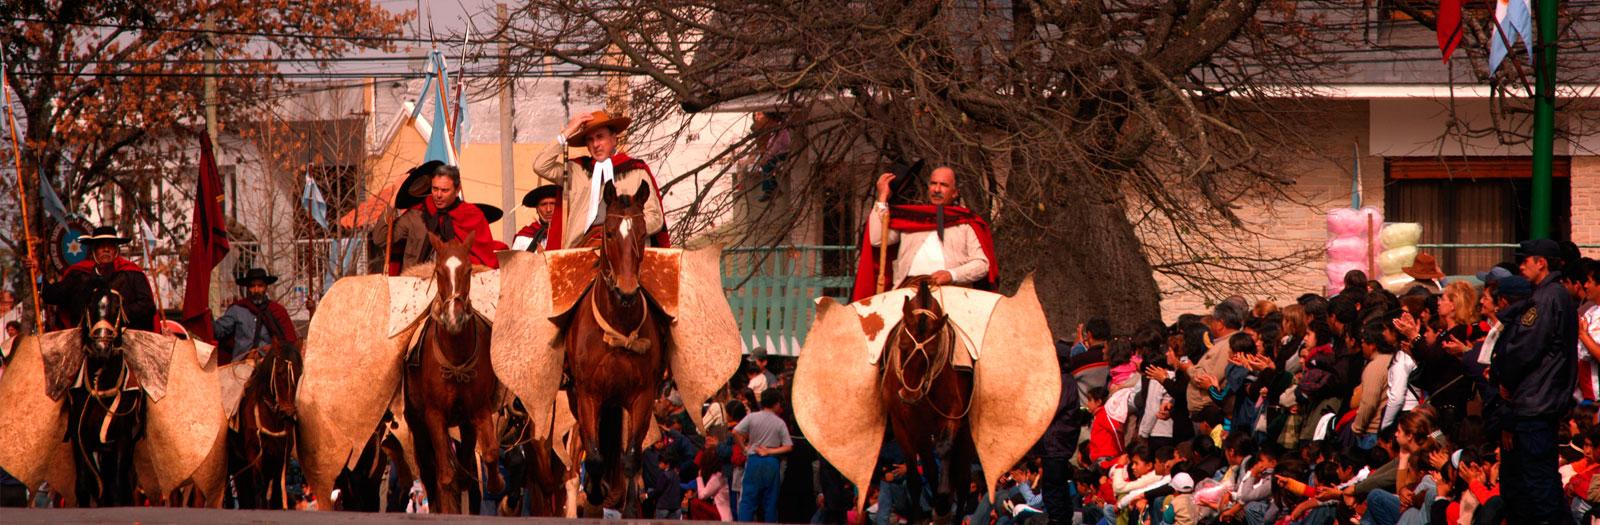 Desfile gaucho, homenaje a Güemes, Salta. Por Eliseo Miciu (gentileza de turismo.salta.gov.ar)